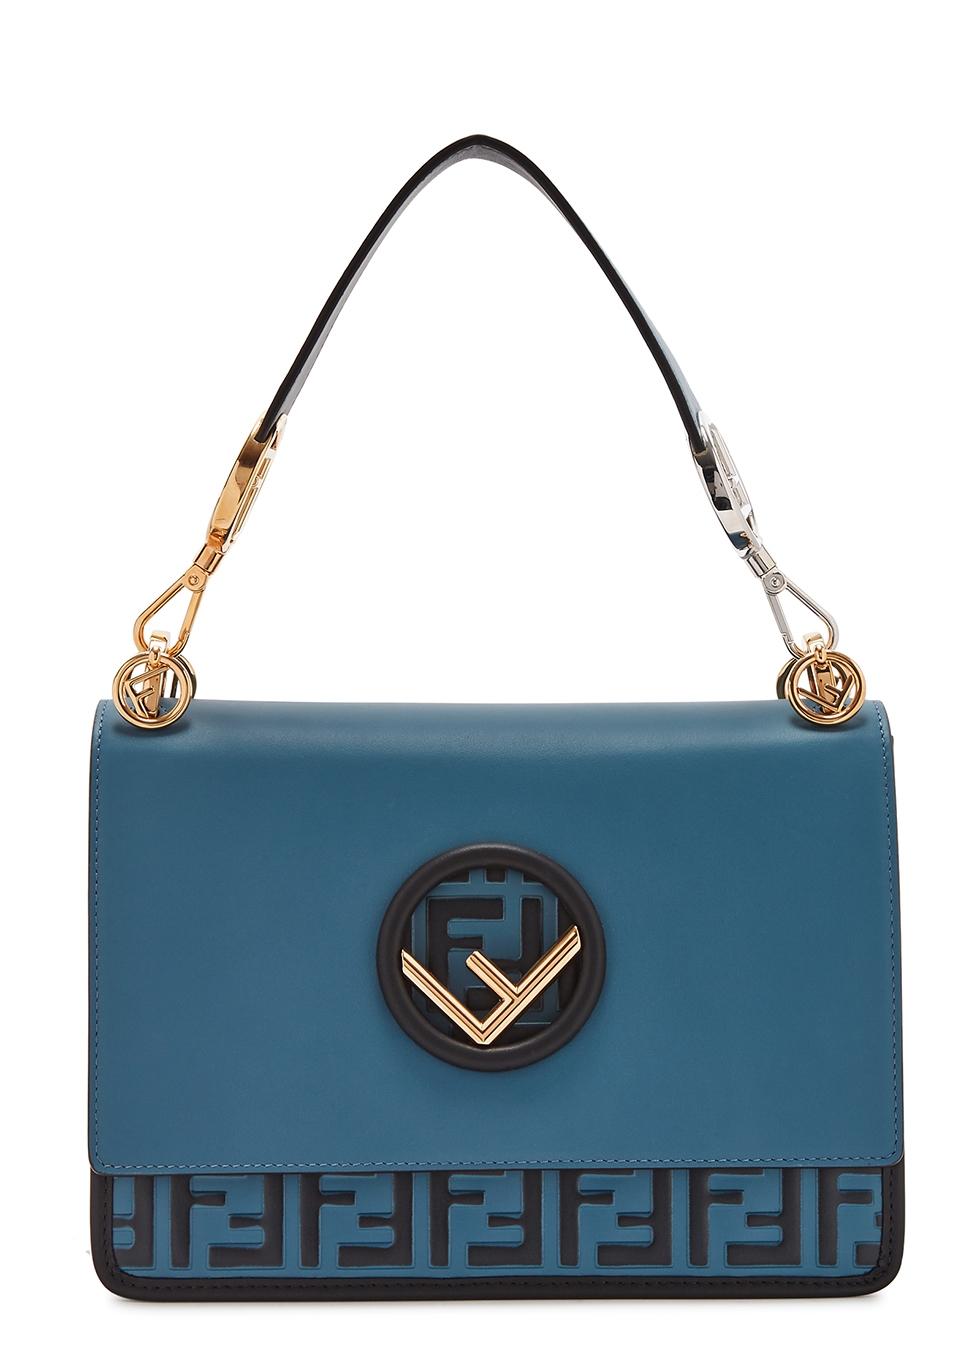 2ff71e56ac Women's Designer Bags, Handbags and Purses - Harvey Nichols